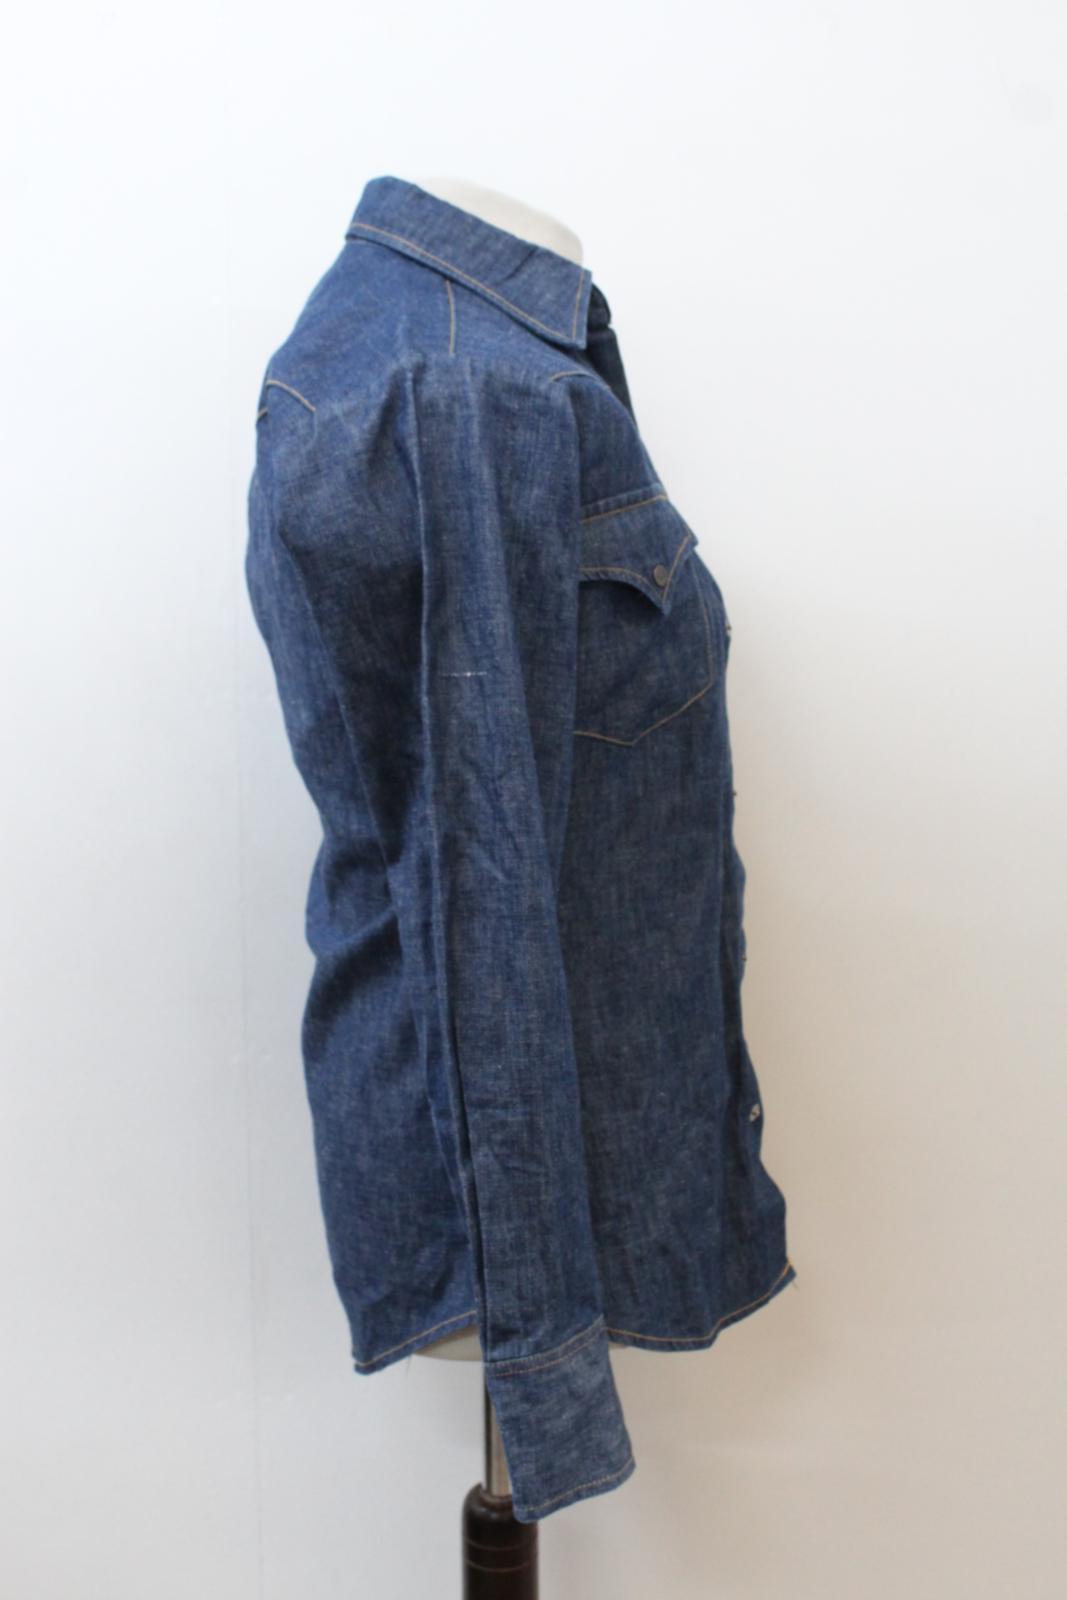 Lee-Jeans-de-hombre-Vintage-Denim-Azul-Algodon-con-Corchetes-Cierre-Mangas-Largas-Camisa-S miniatura 5